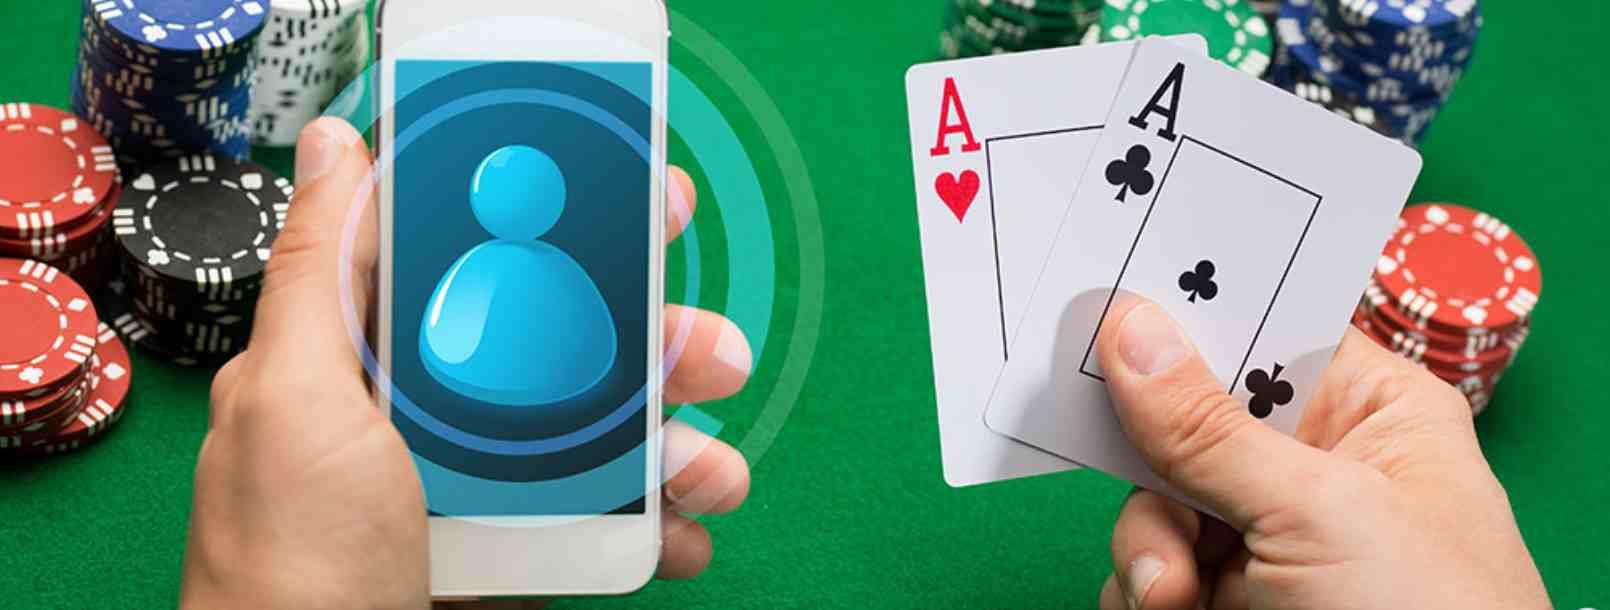 avantajul secret la cazinourile online